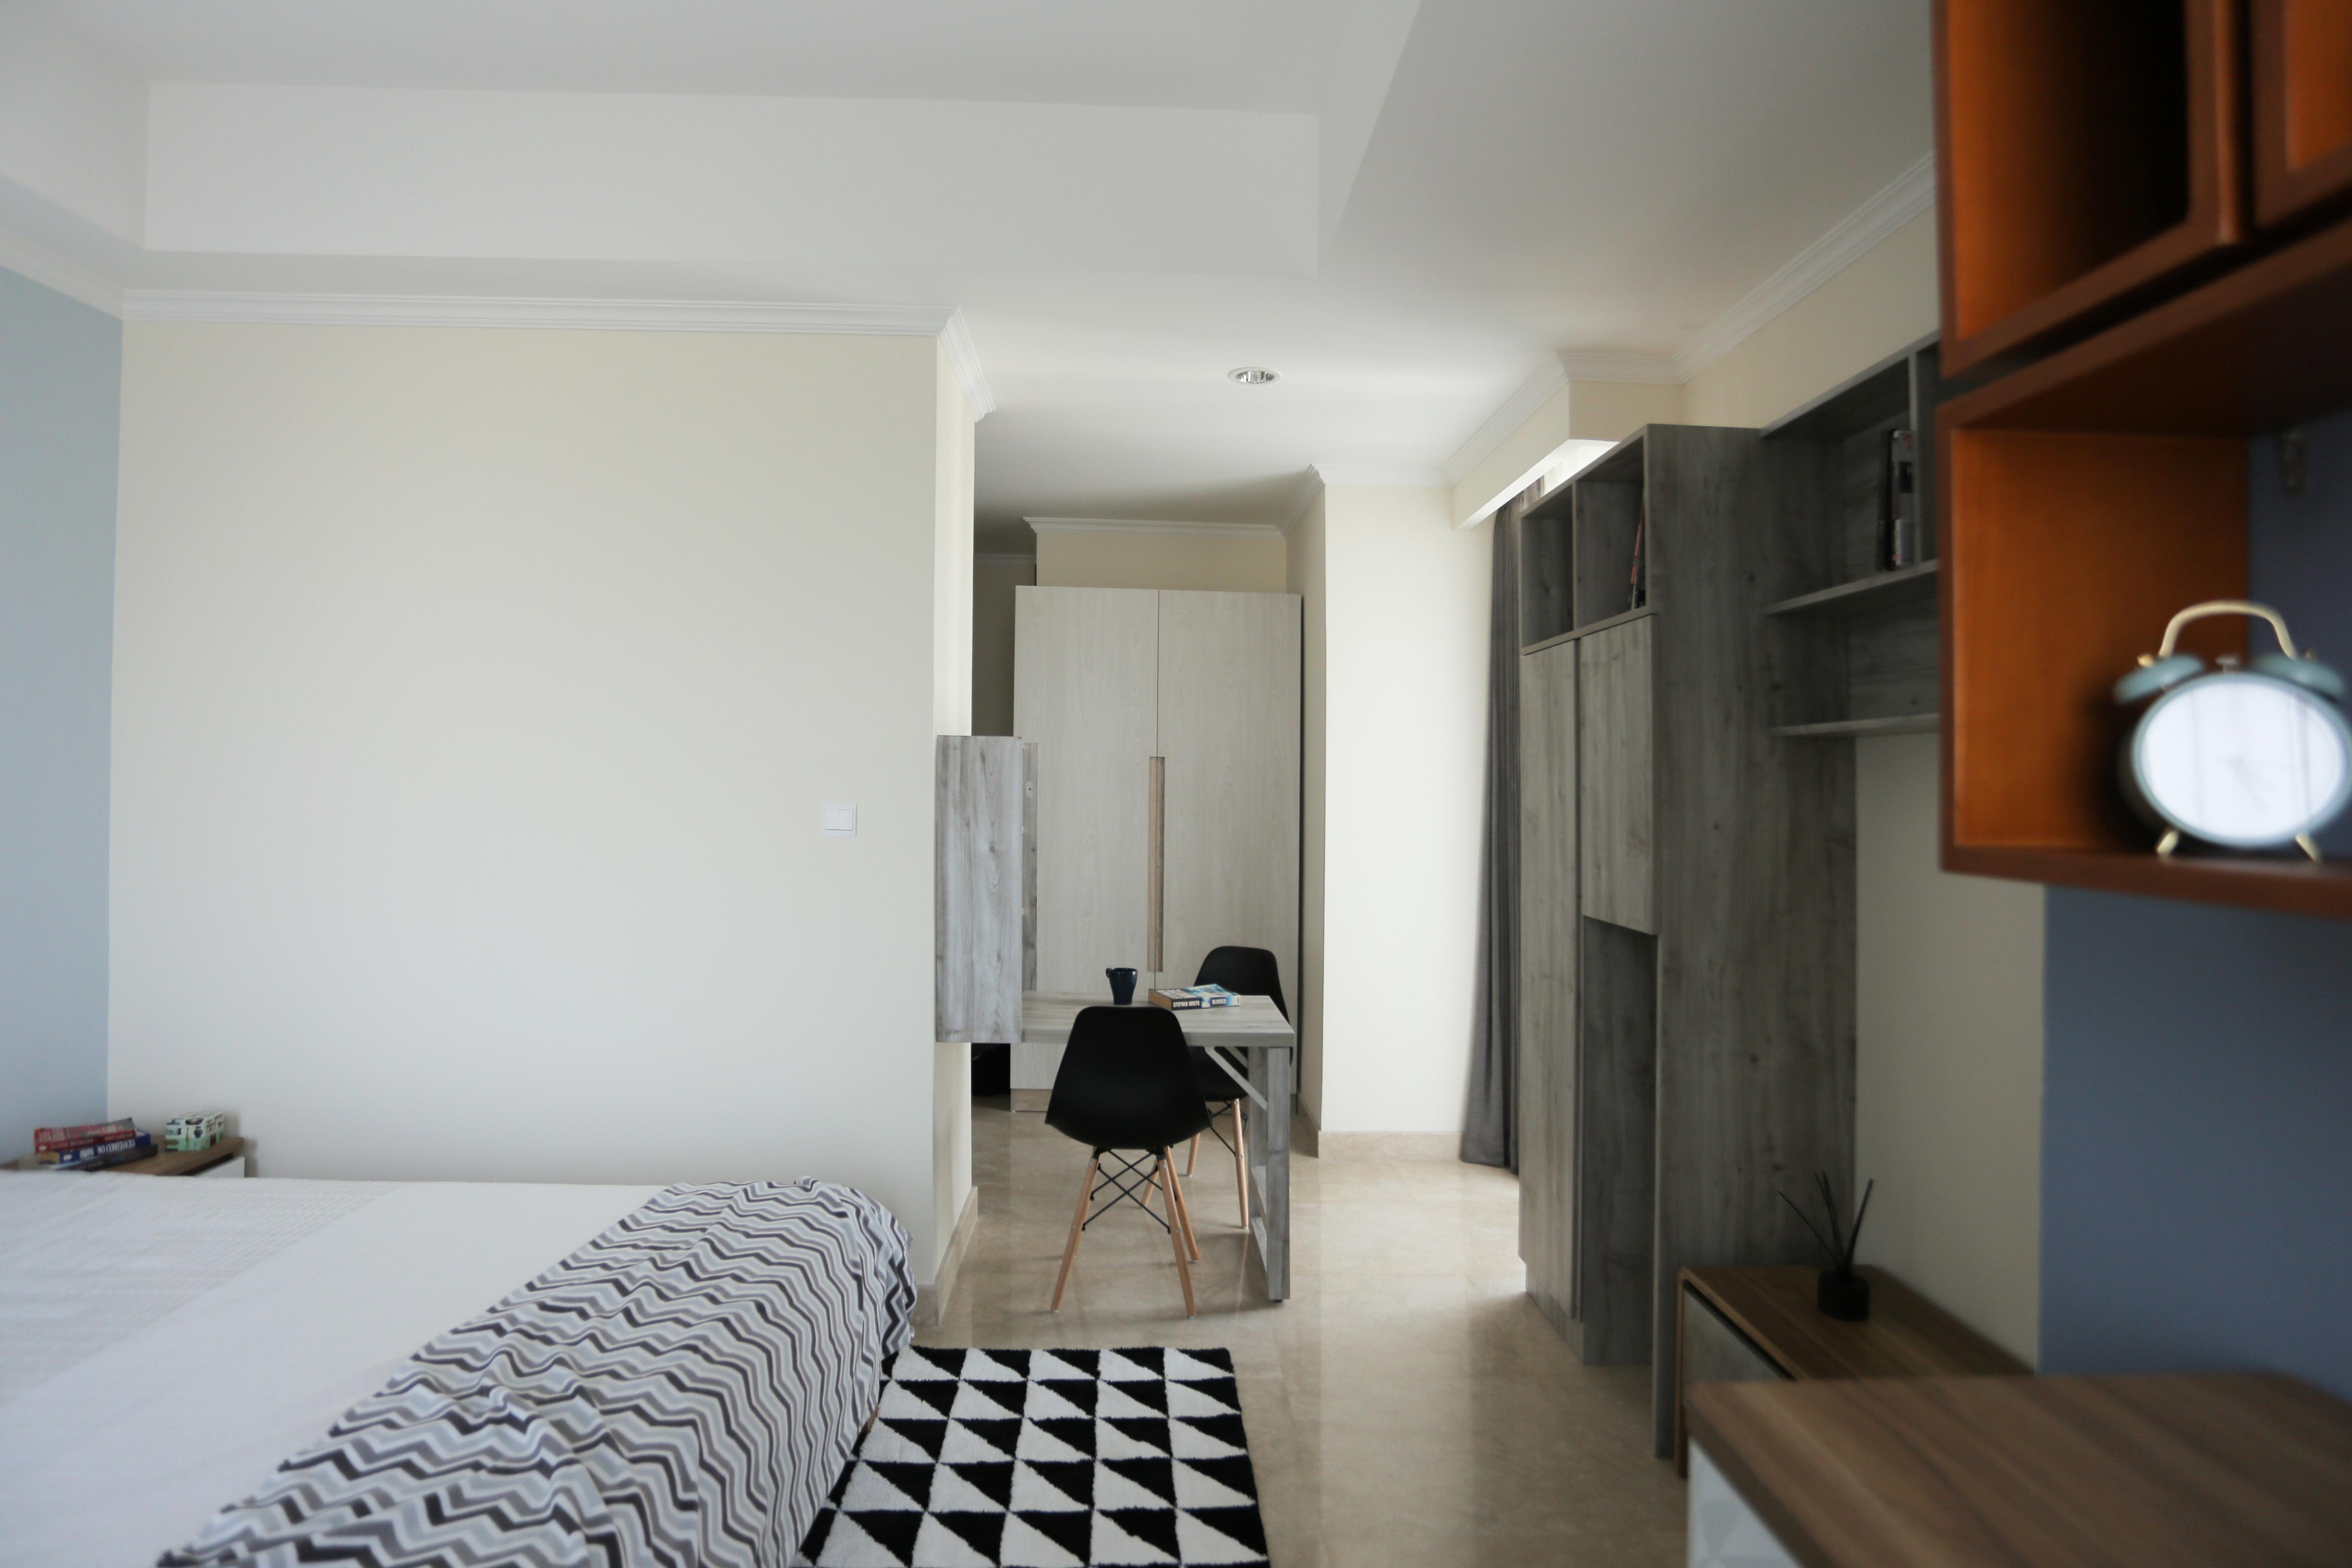 Stellas apartment